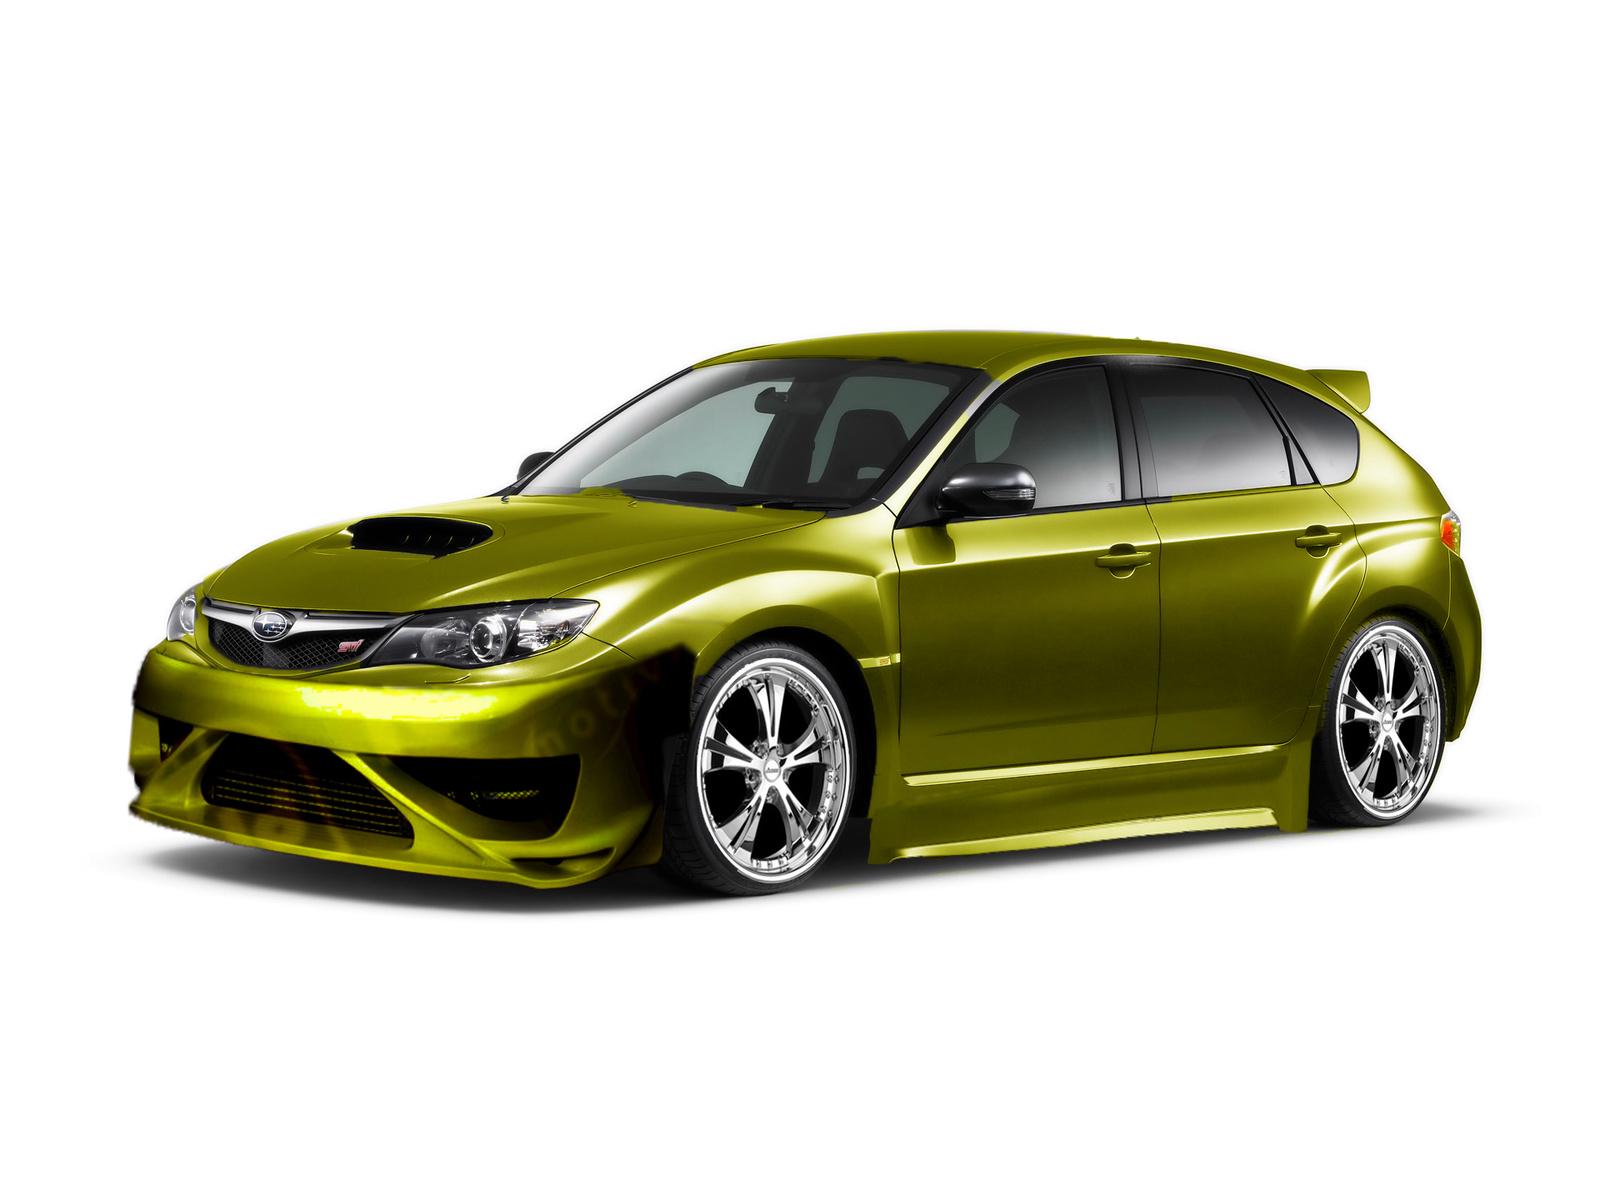 2008 Subaru Impreza Wrx Sti Pictures Cargurus